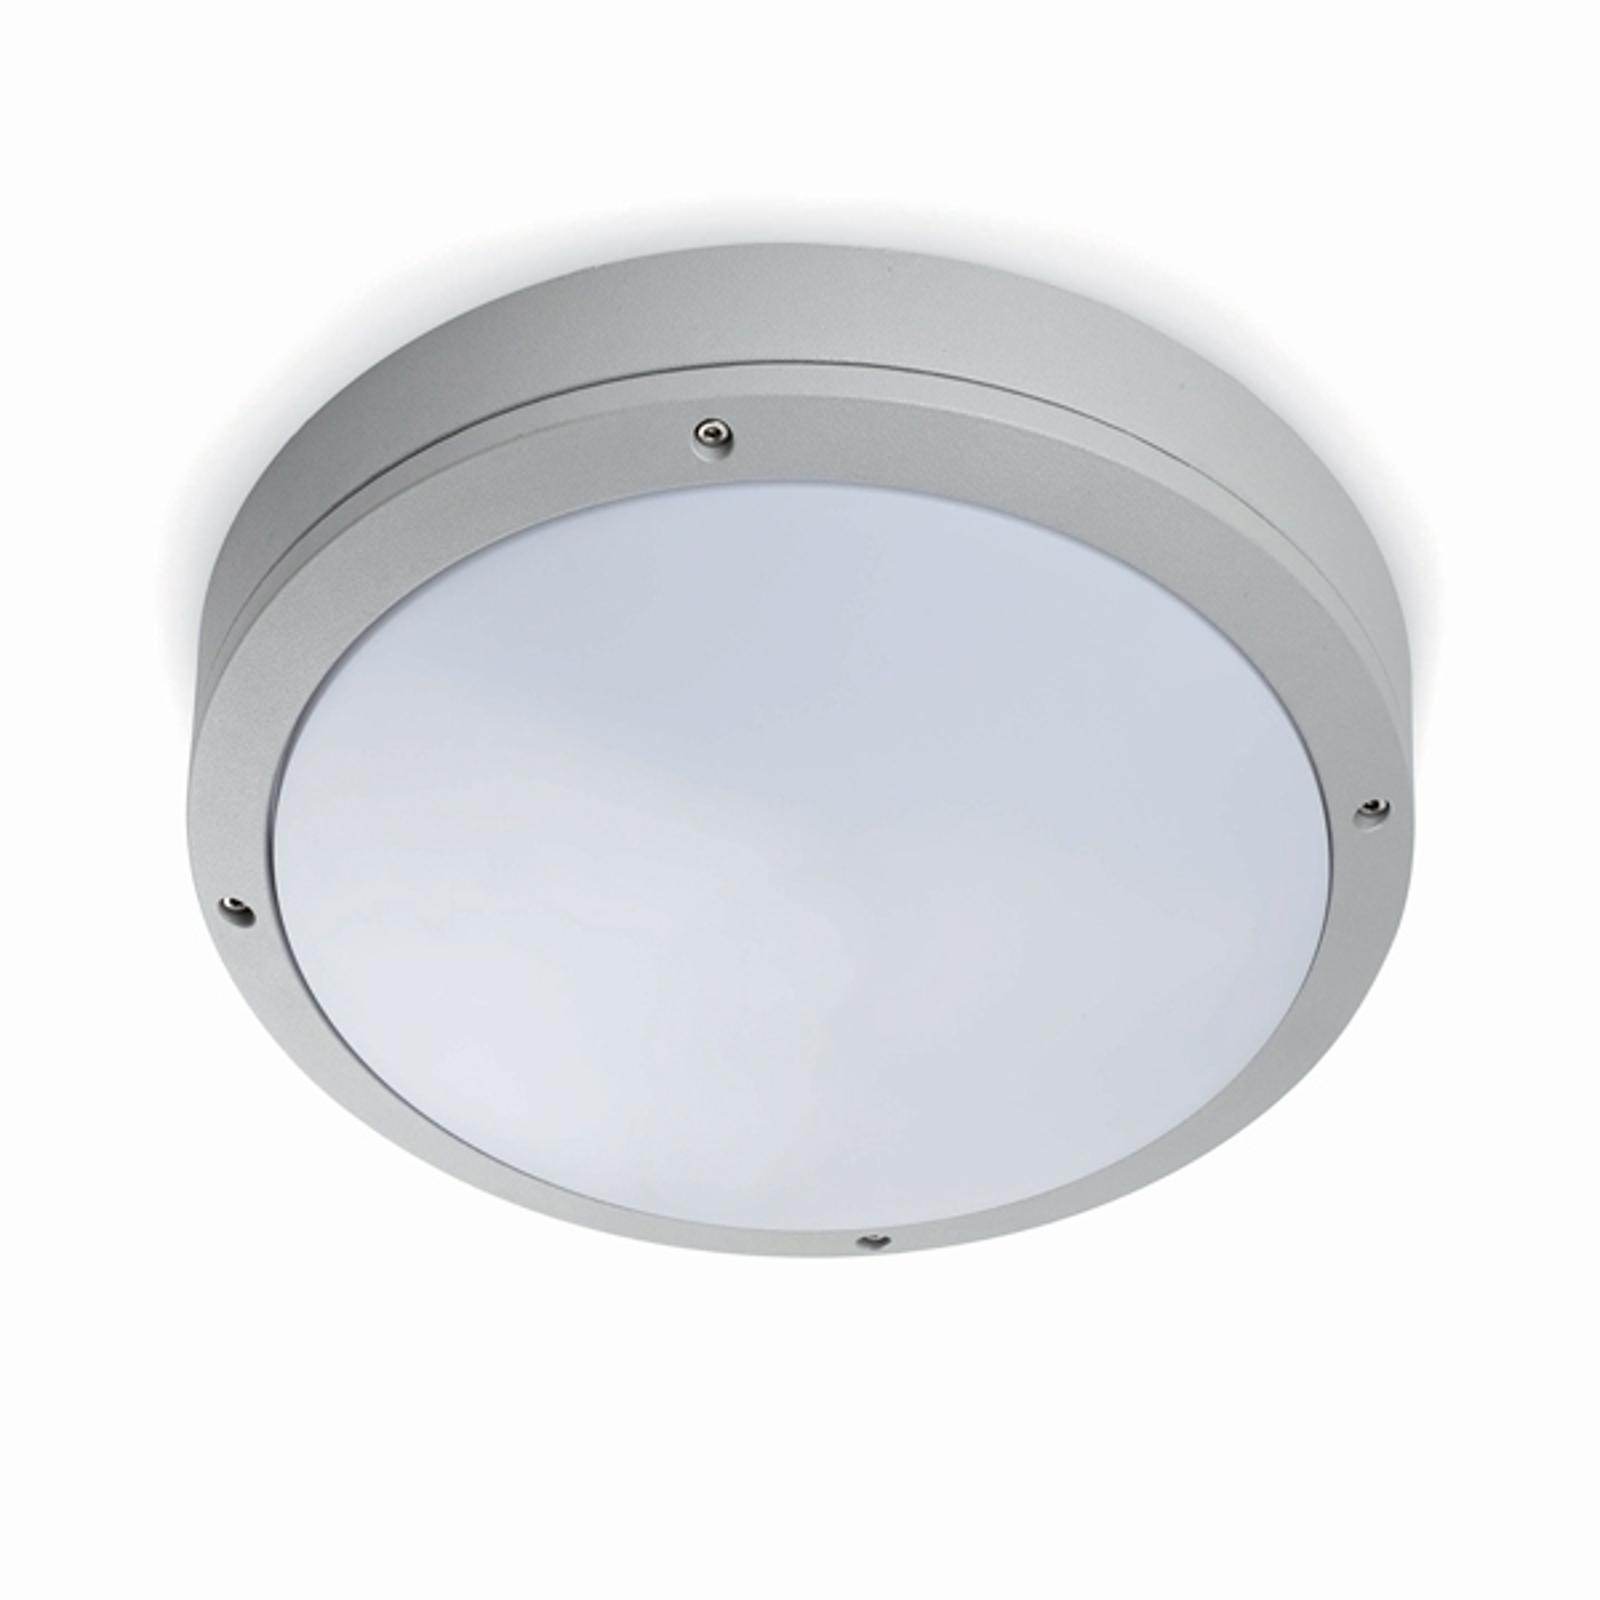 Yen Simple Exterior Ceiling Lamp_3505101_1